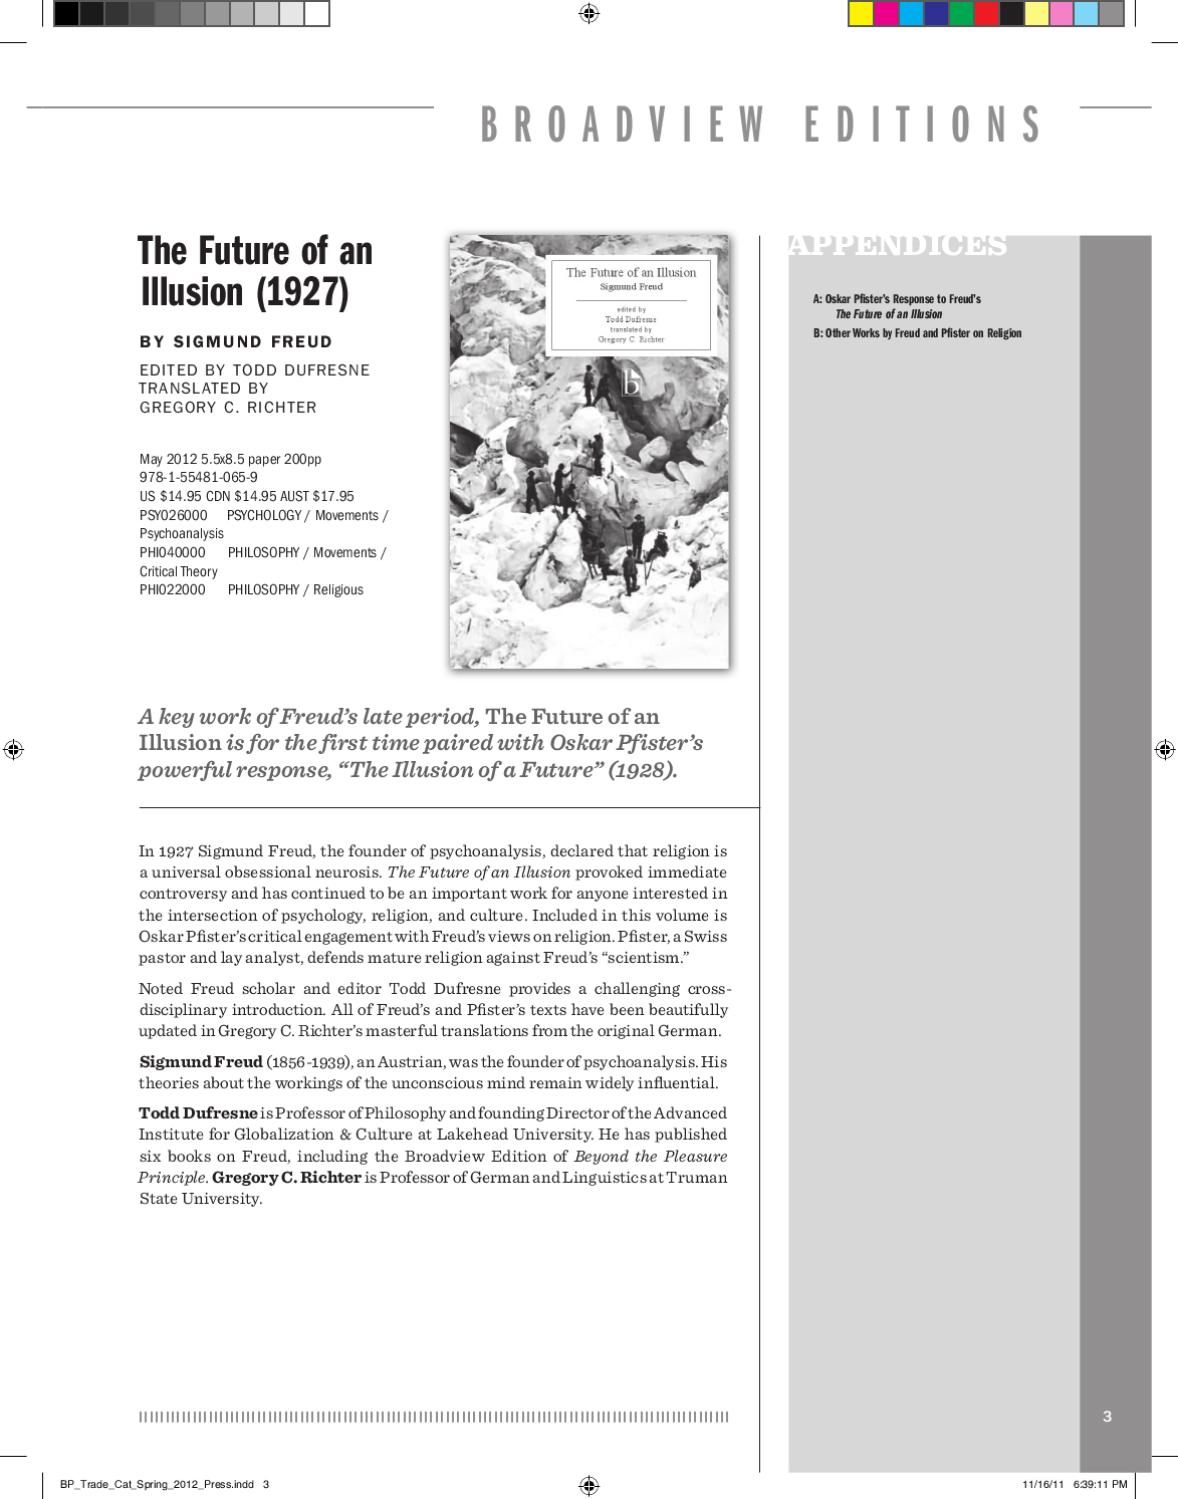 Broadview Press Trade Catalogue Spring 2012 - Press PDF by